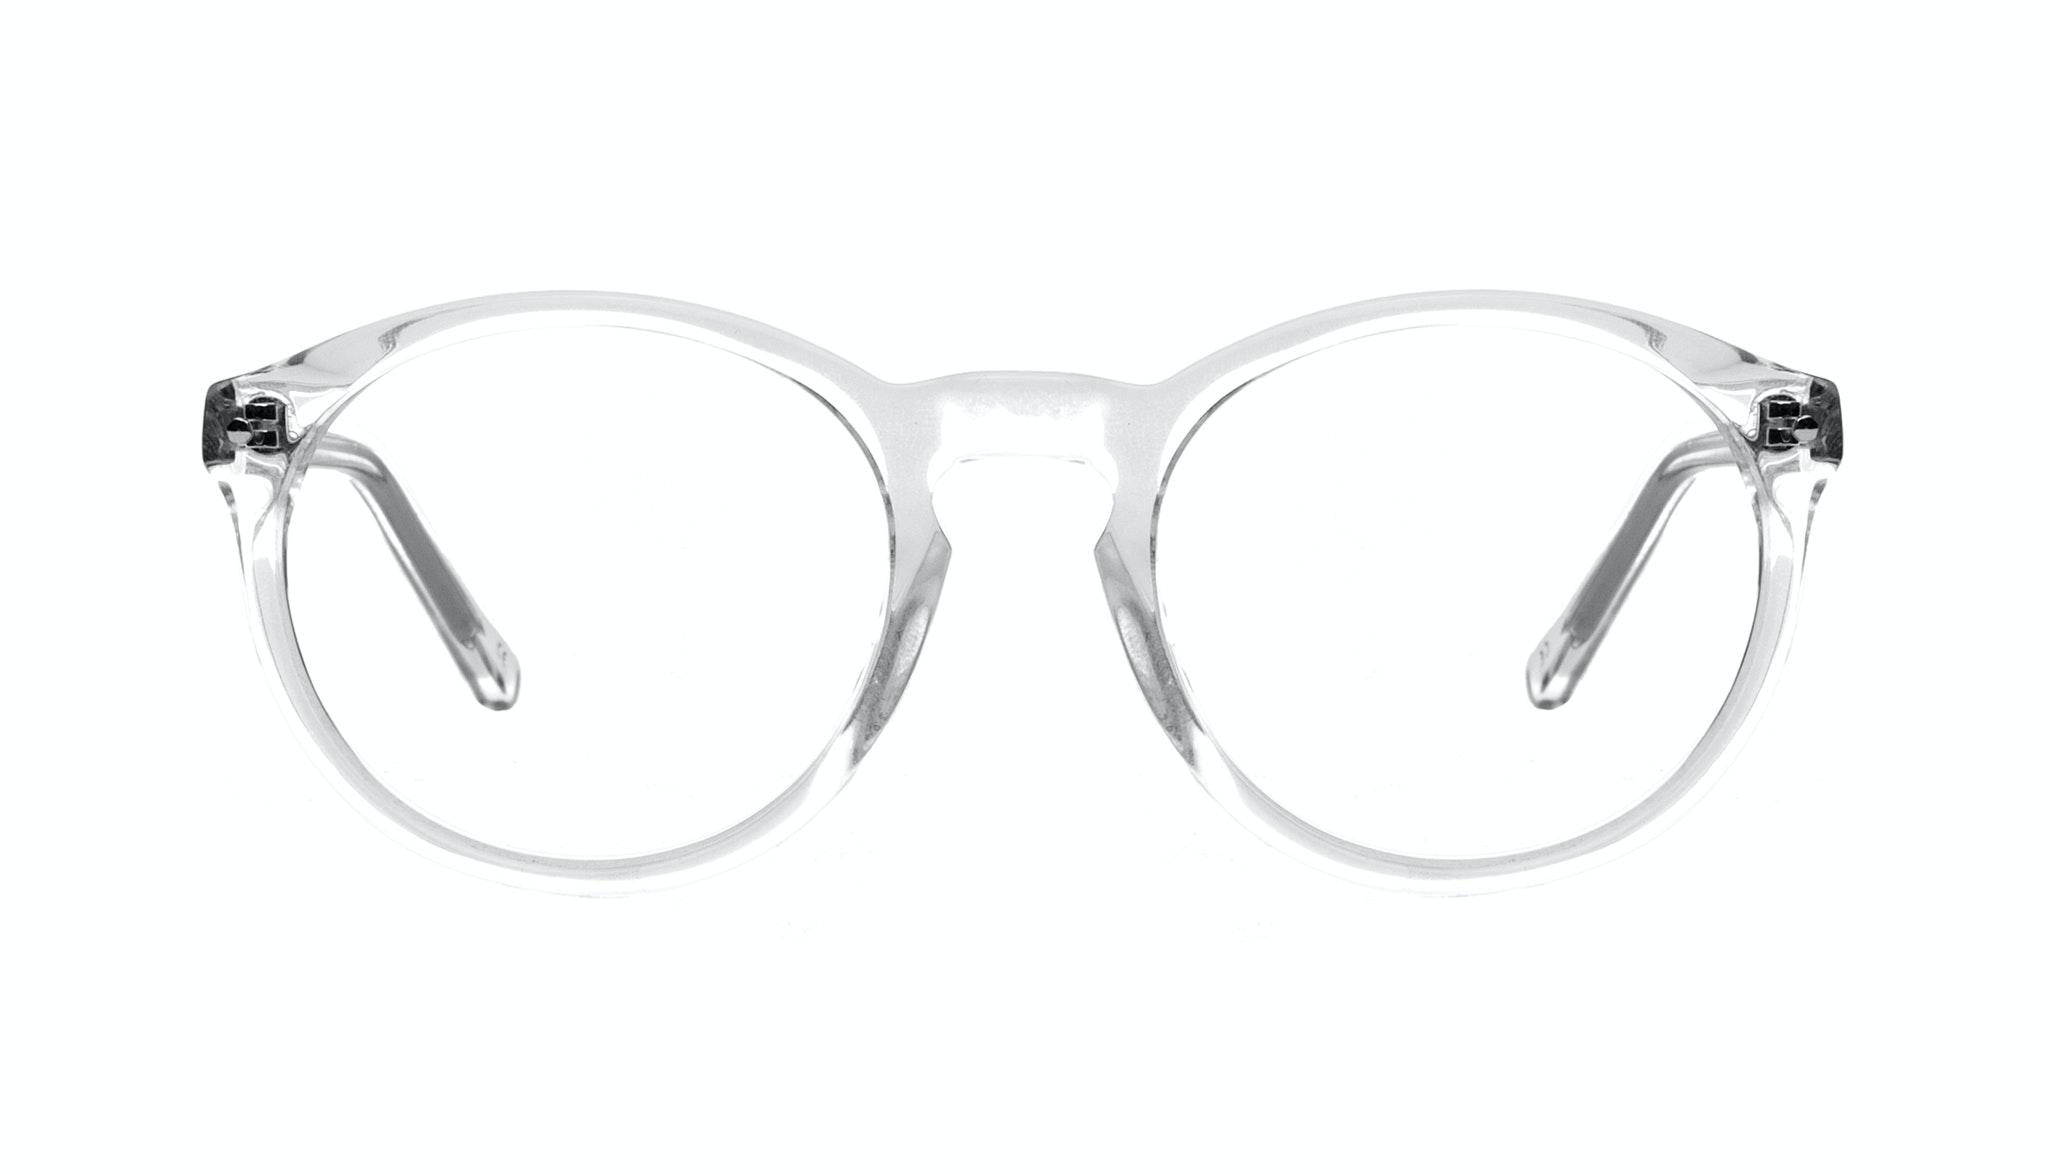 Affordable Fashion Glasses Round Eyeglasses Women Glow Diamond